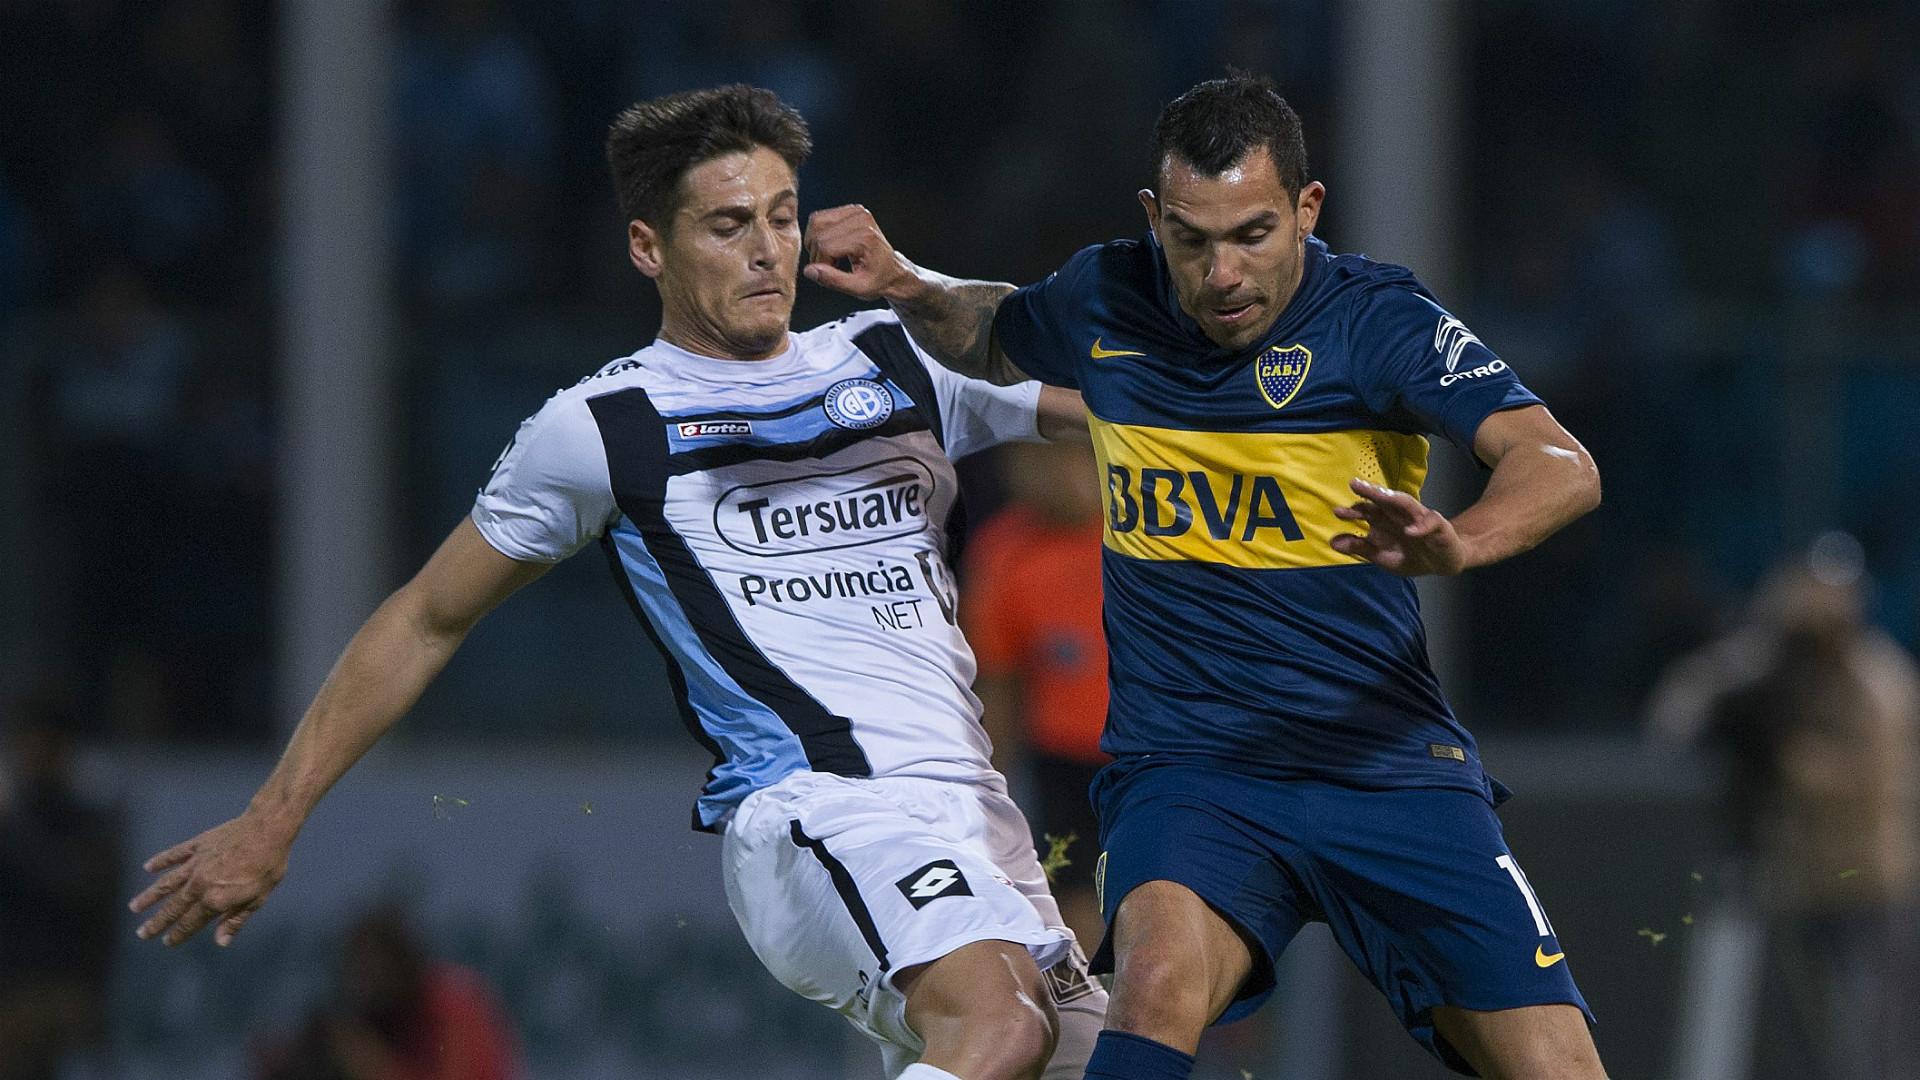 Sebastian Prediger Carlos Tevez Belgrano Boca Juniors 2015